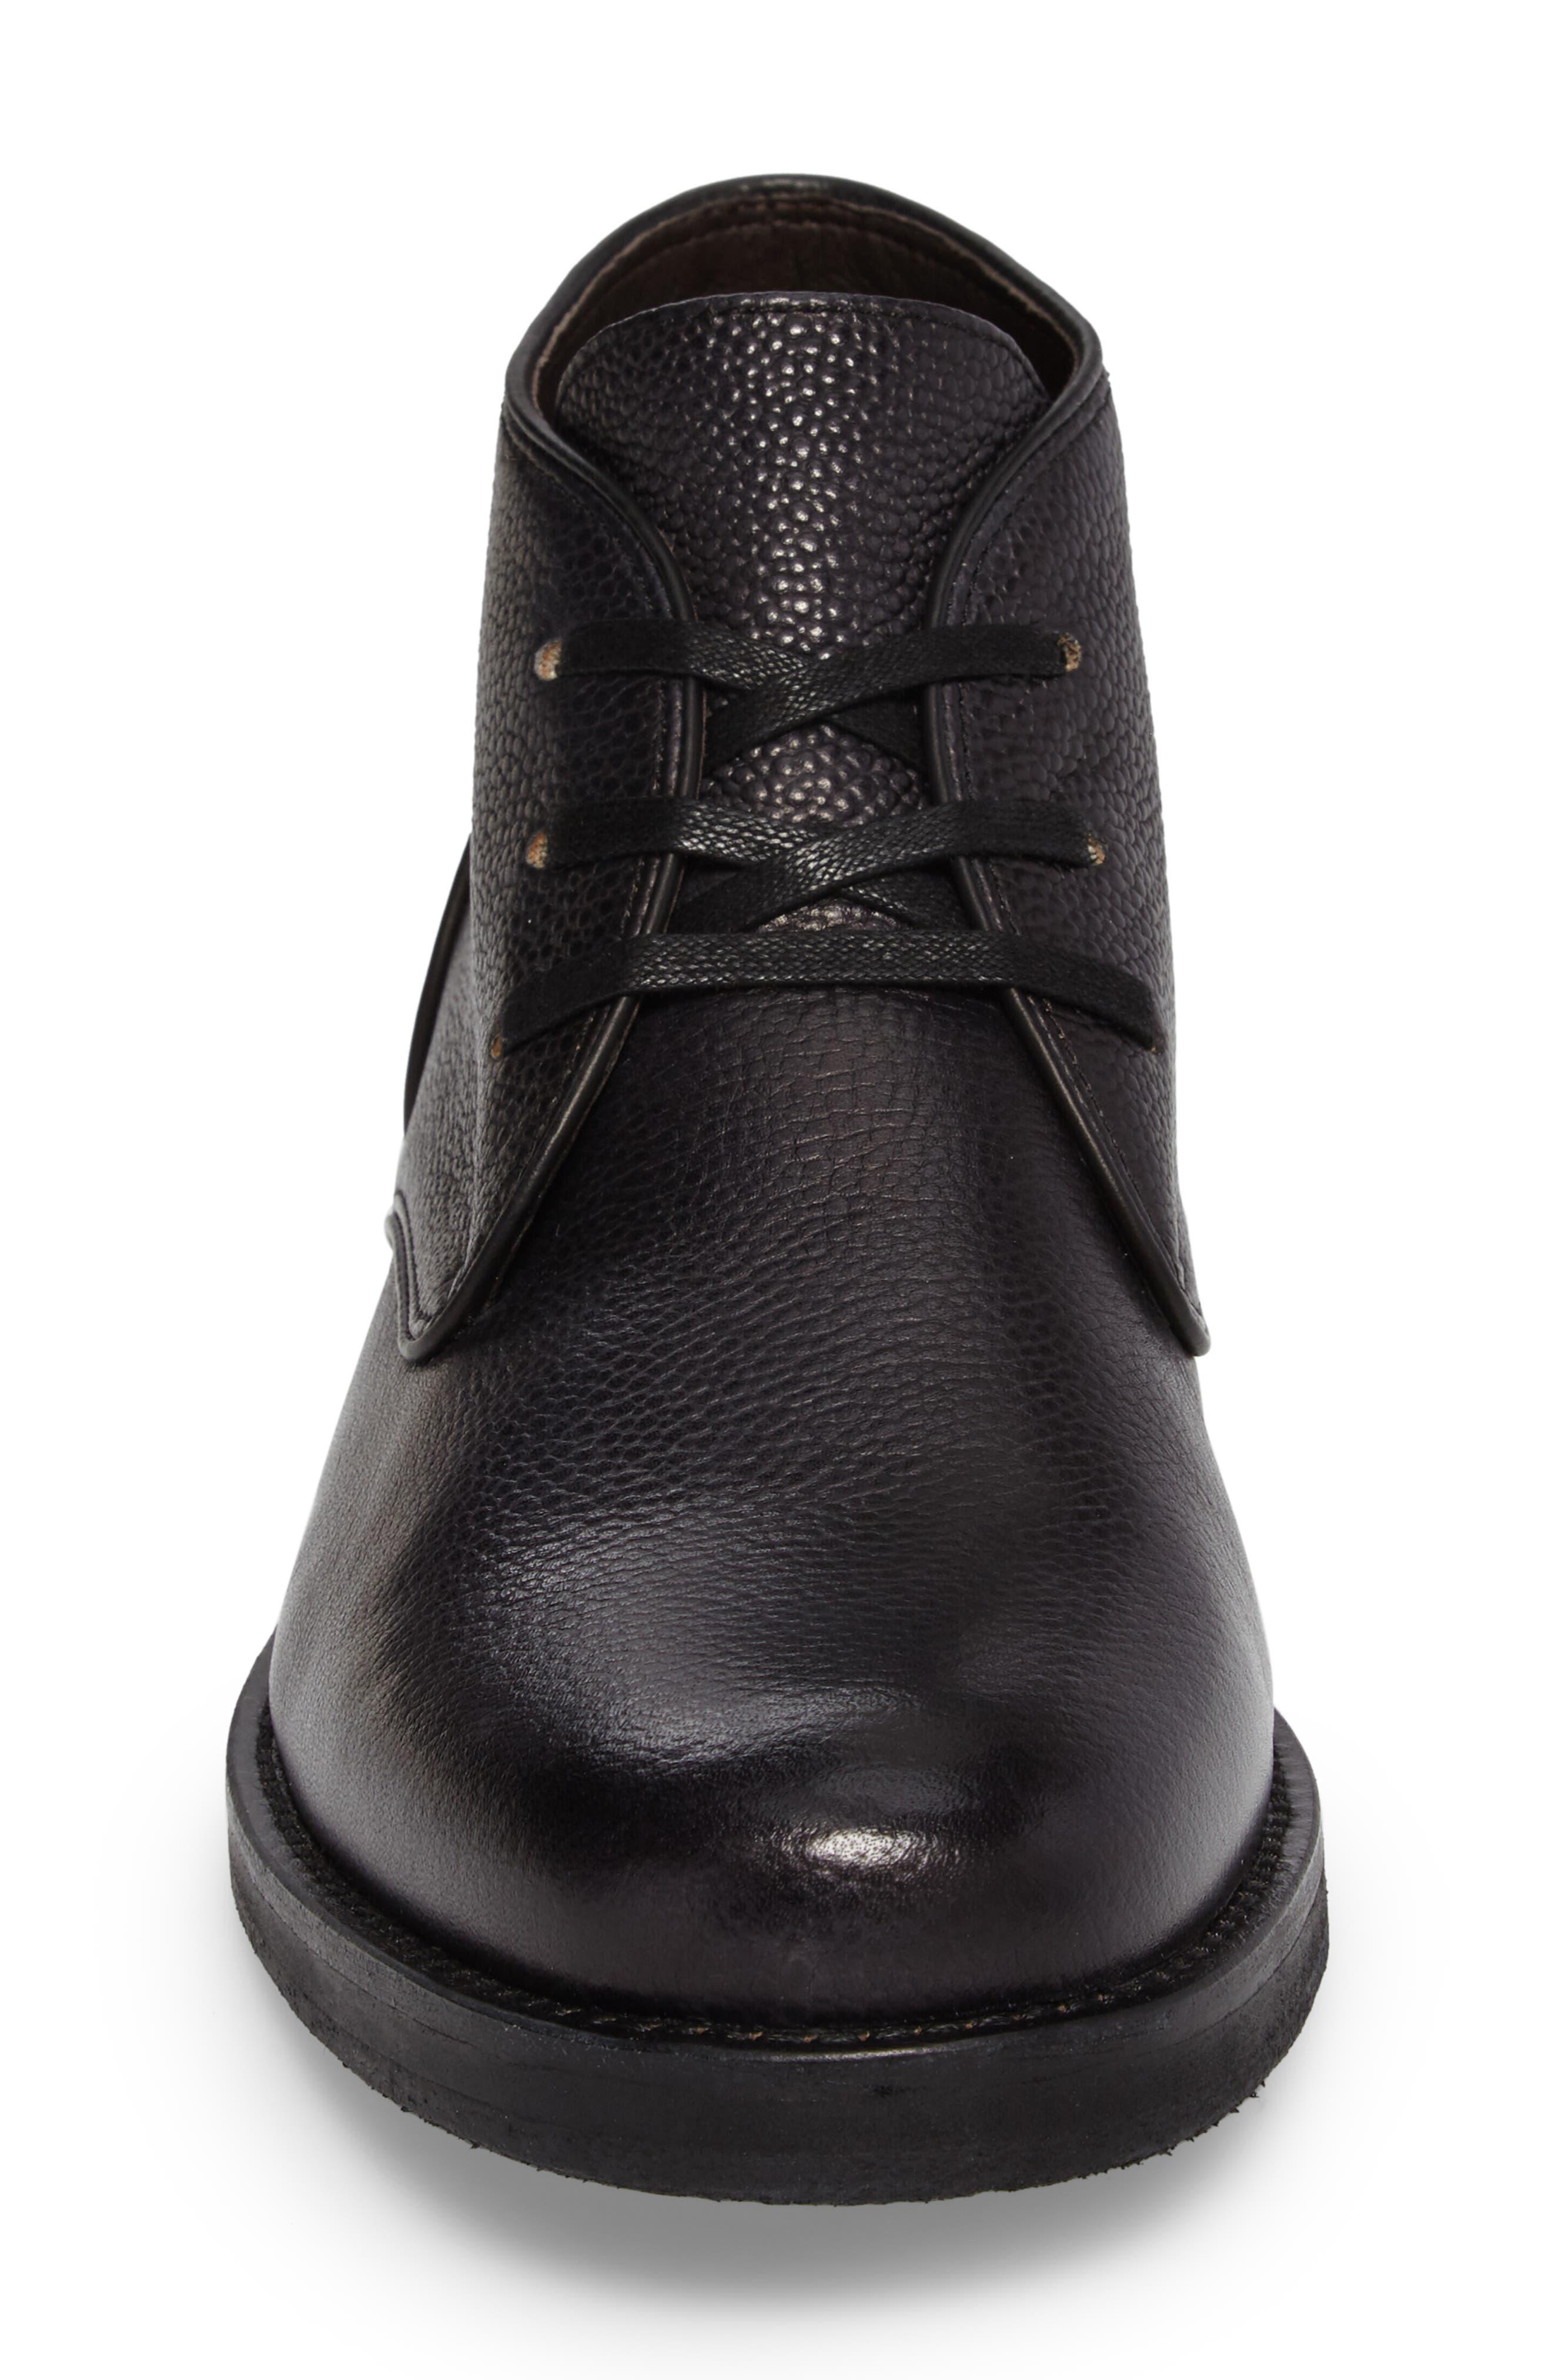 Brooklyn Chukka Boot,                             Alternate thumbnail 4, color,                             Mineral Black